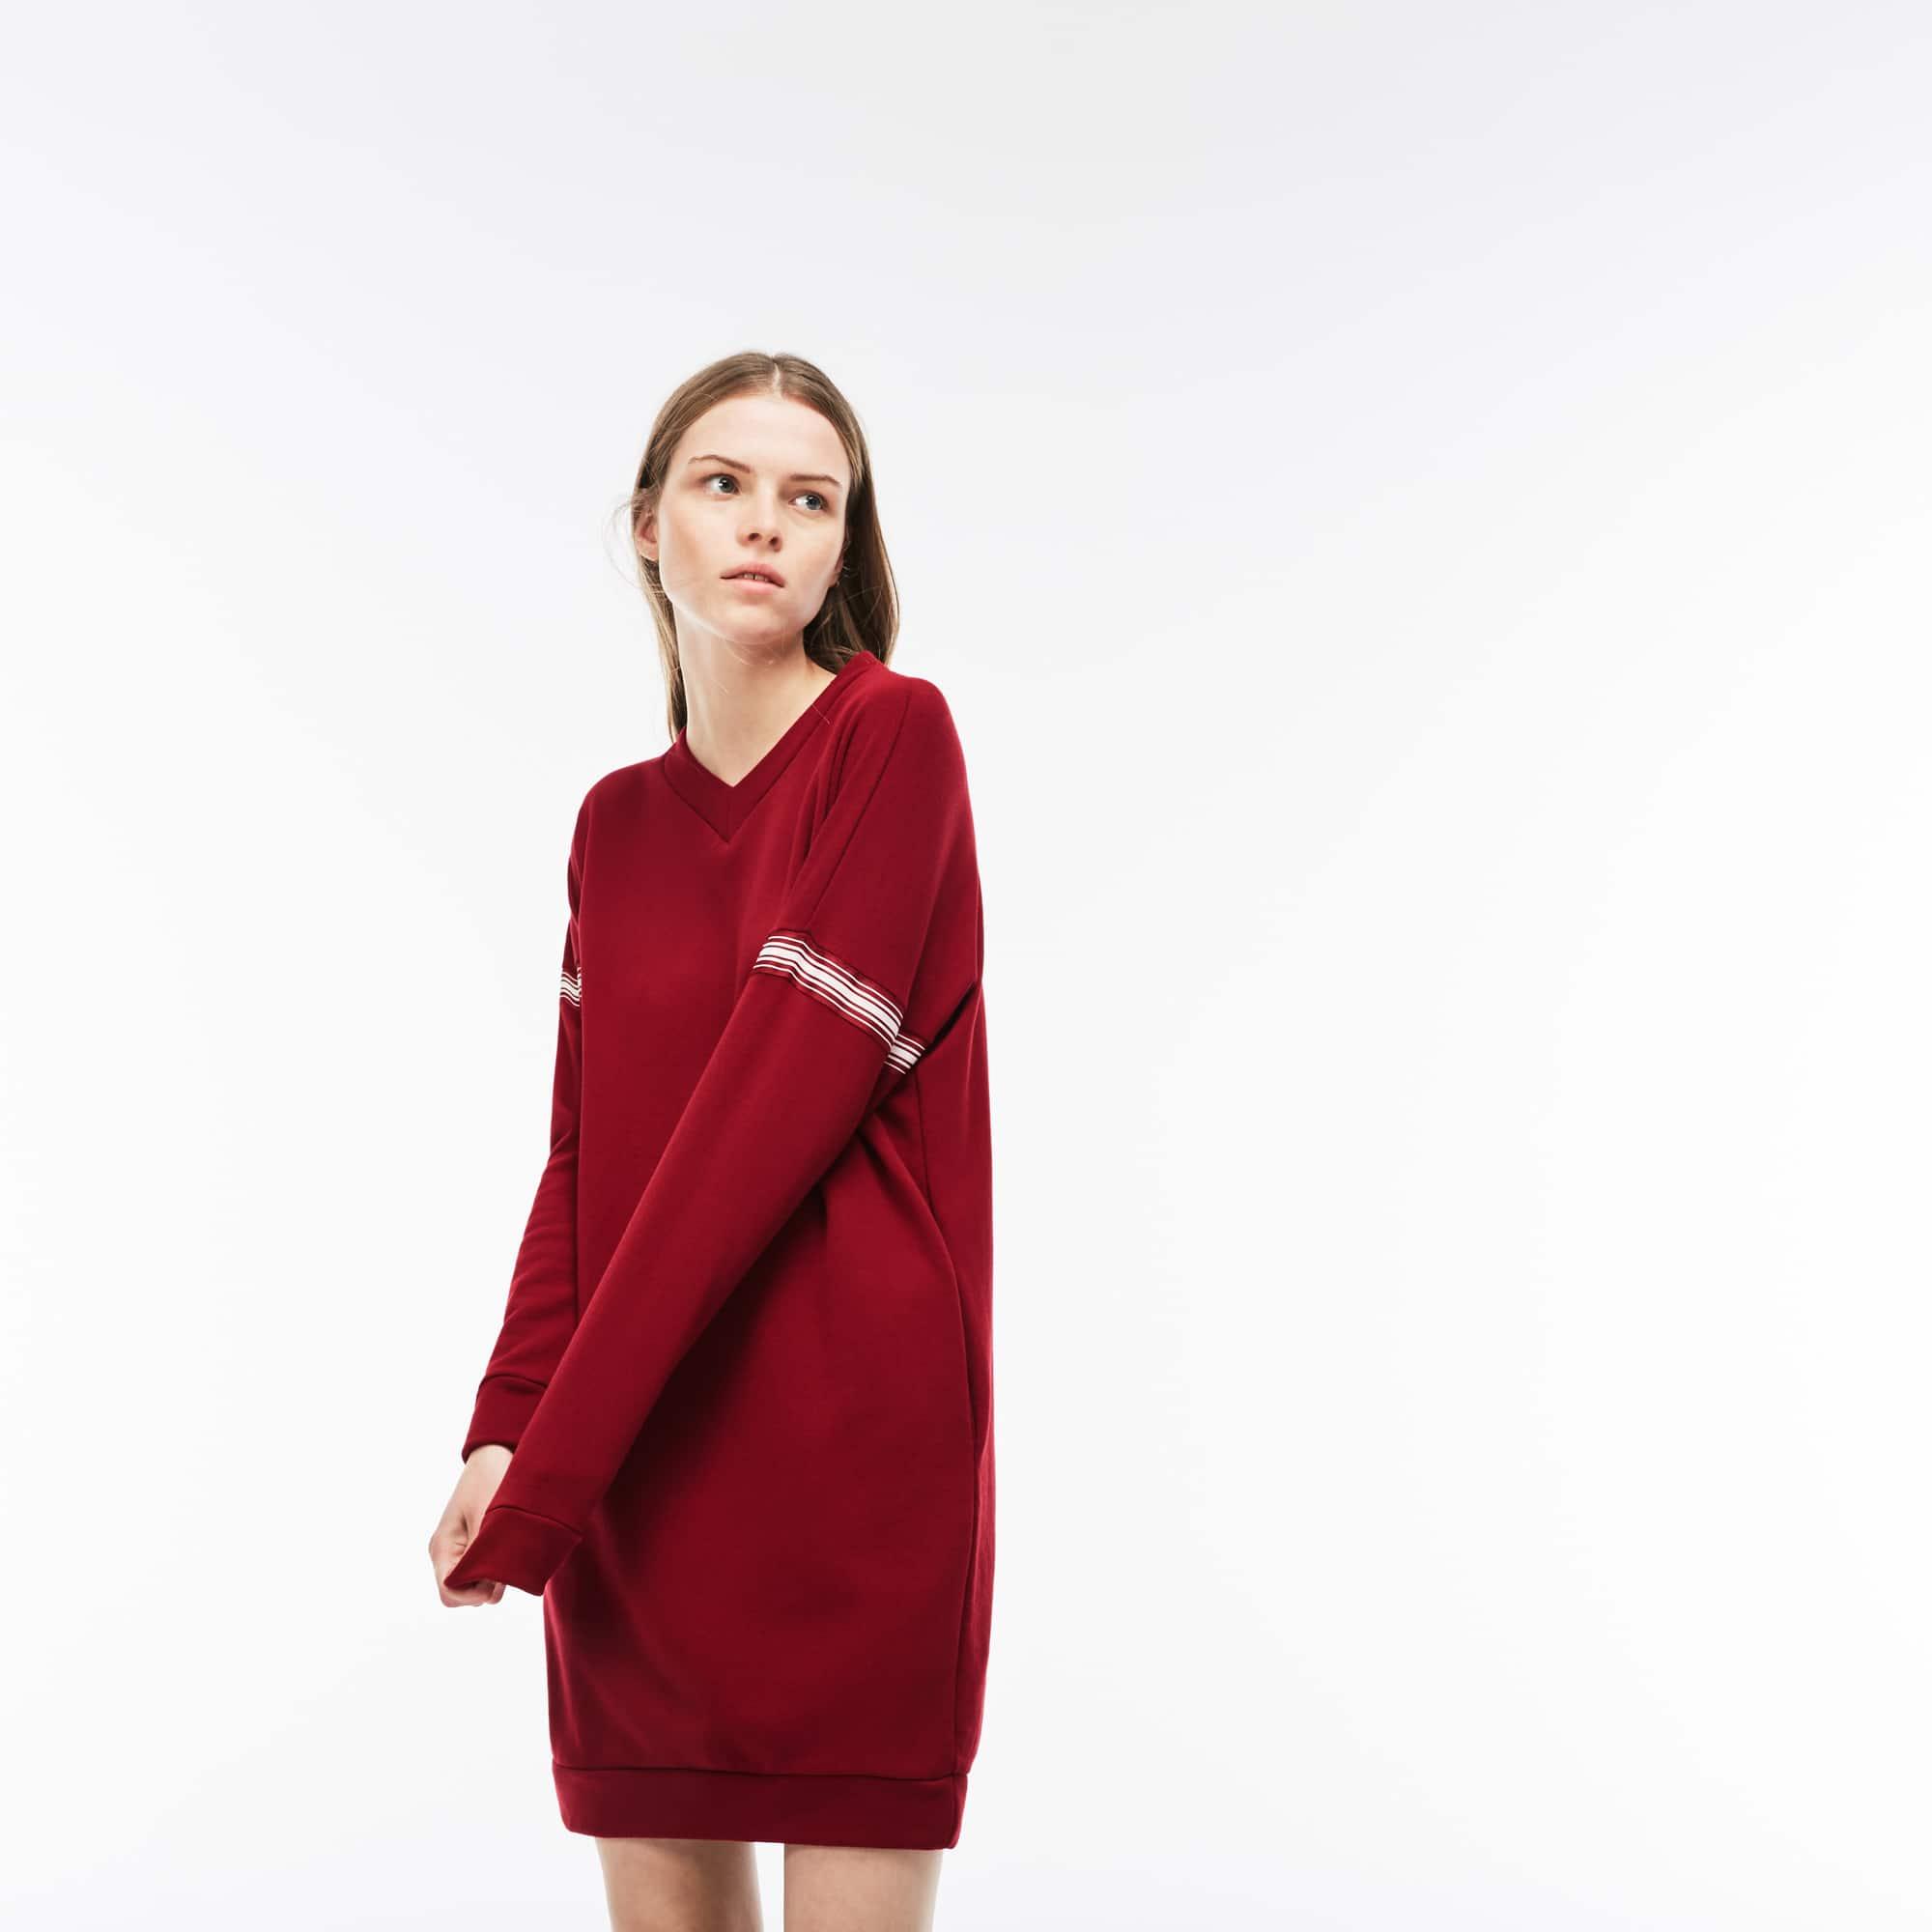 Damen-Sweatshirtkleid aus Krepp-Fleece mit Kontraststreifen